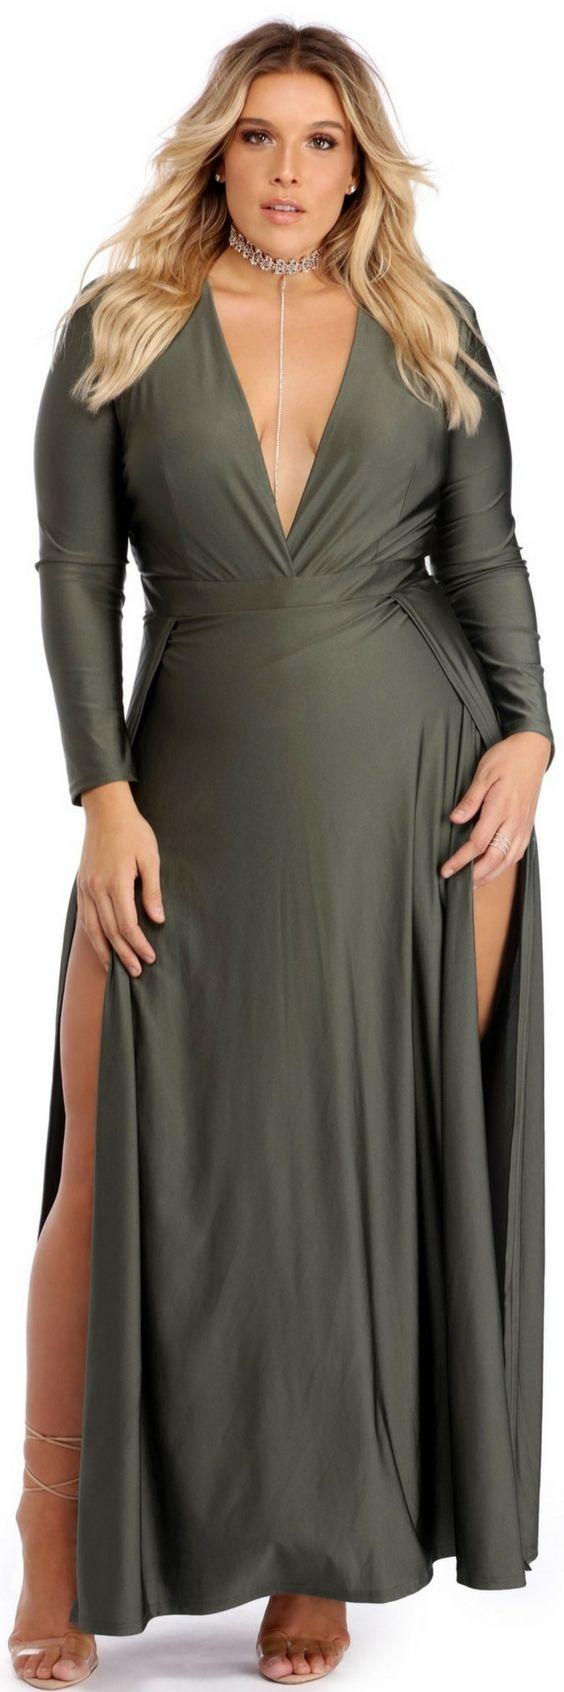 Plus desiree olive double slit dress in fashion bazar